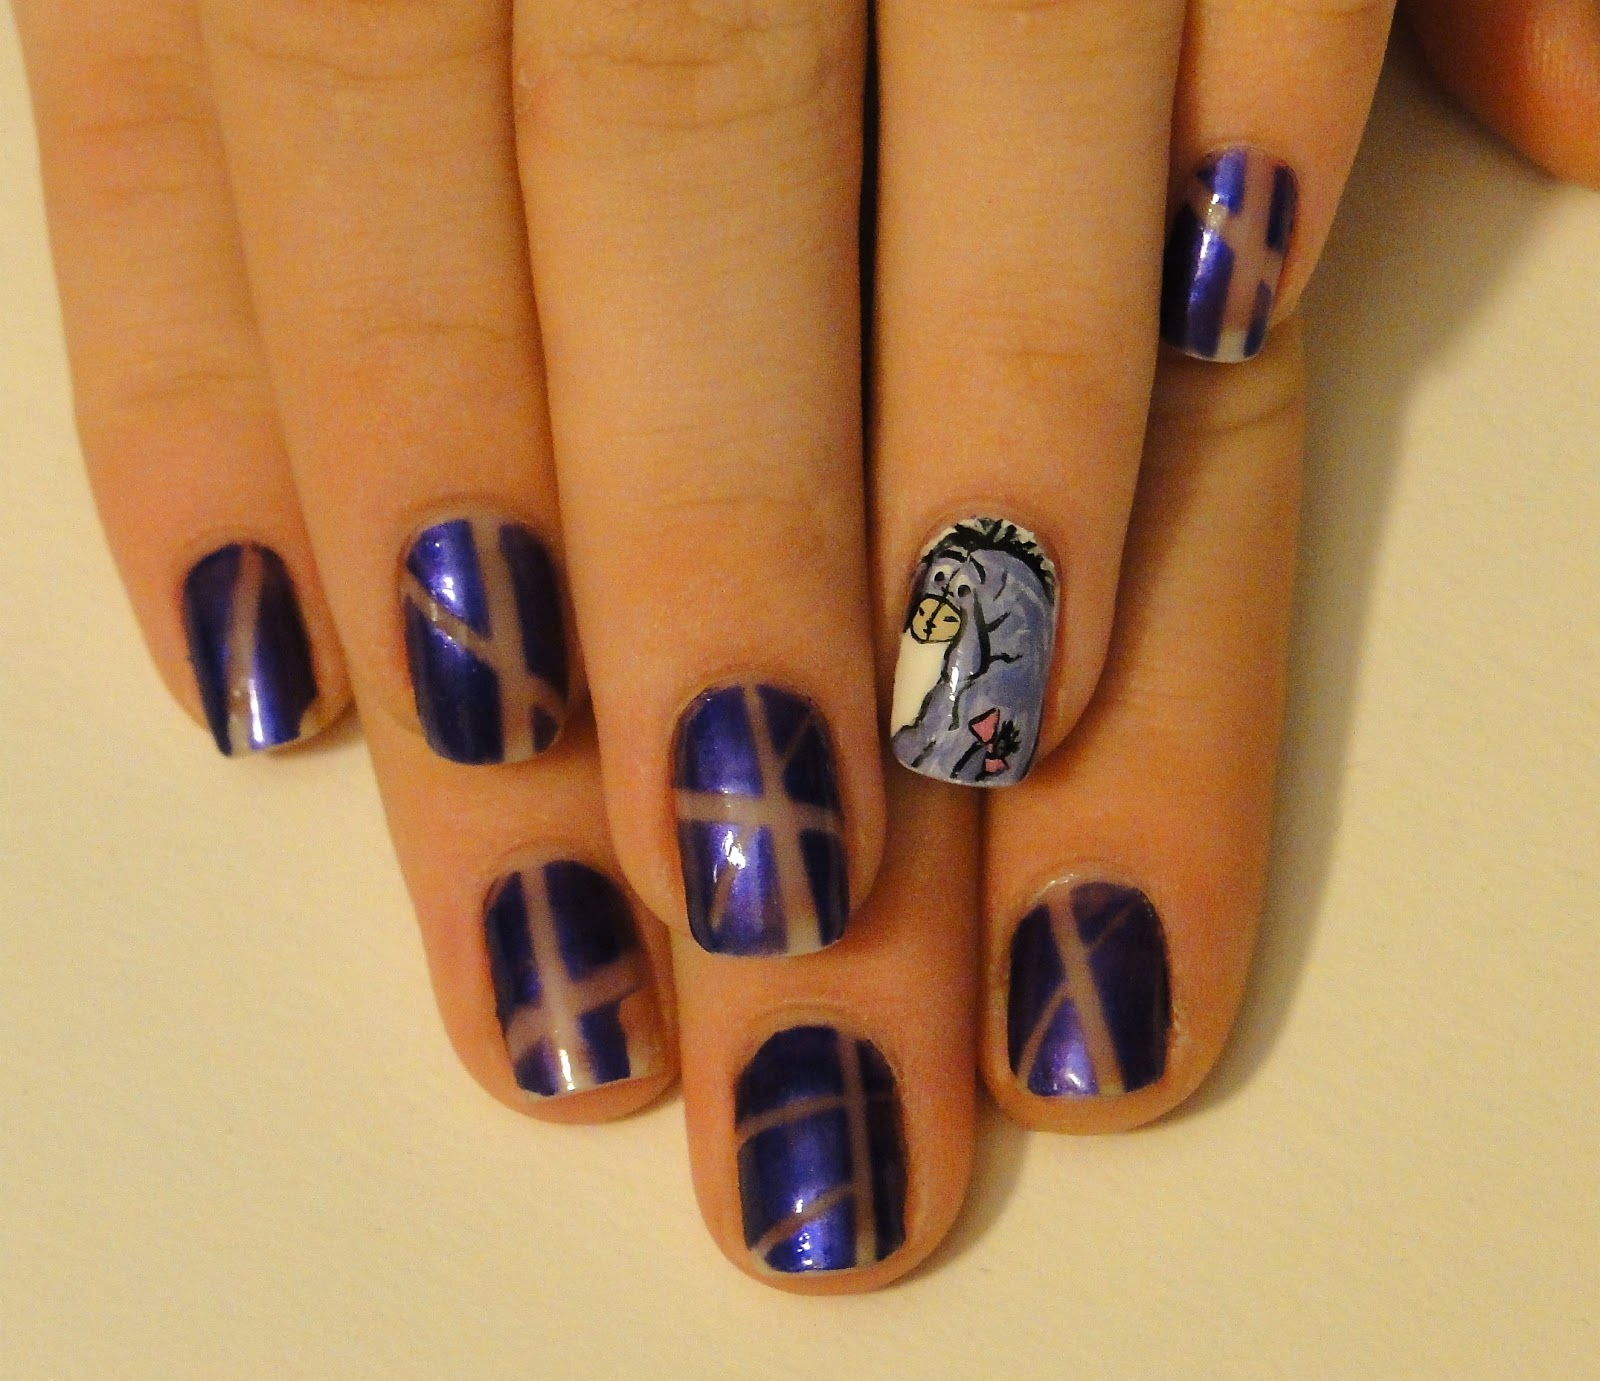 Nail Art Using Painters Tape: WeeklyWackyNails: Eeyore Nails!!! :